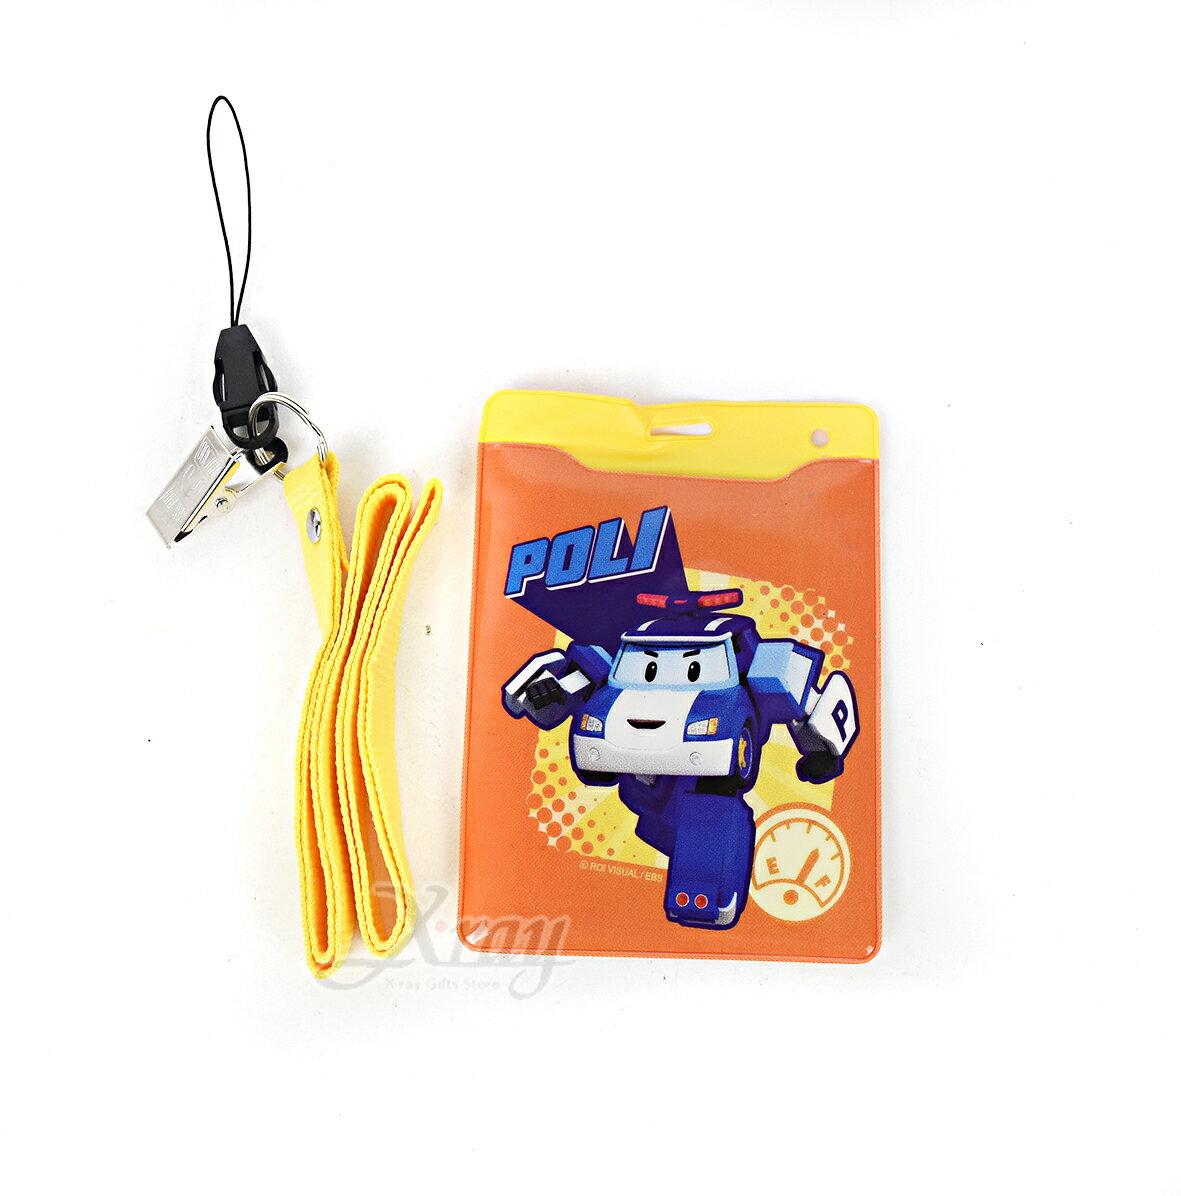 <br/><br/>  X射線【C844911】波力吊袋證件套,收納包/文具包/隨身包/手提包/零錢包/交換禮物/禮品<br/><br/>